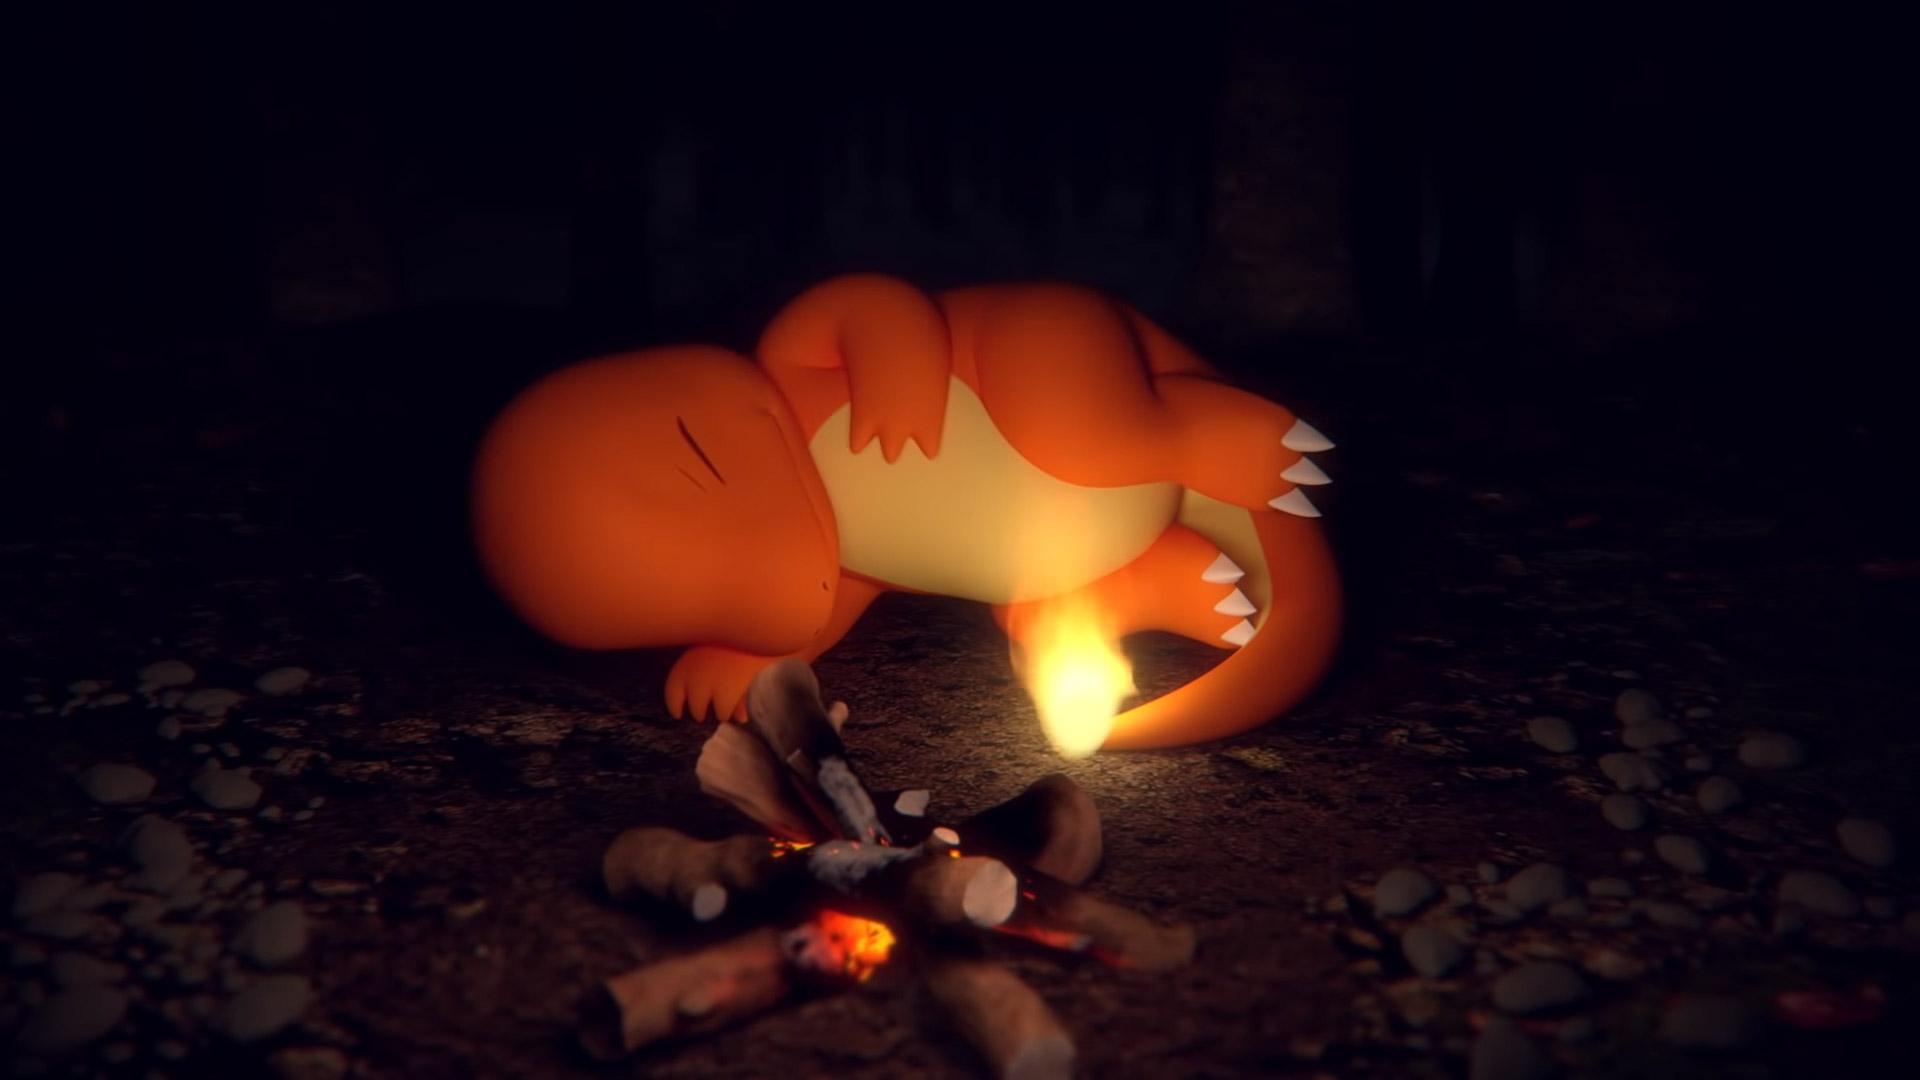 The Pokemon Company is cool with us watching a Charmander sleep